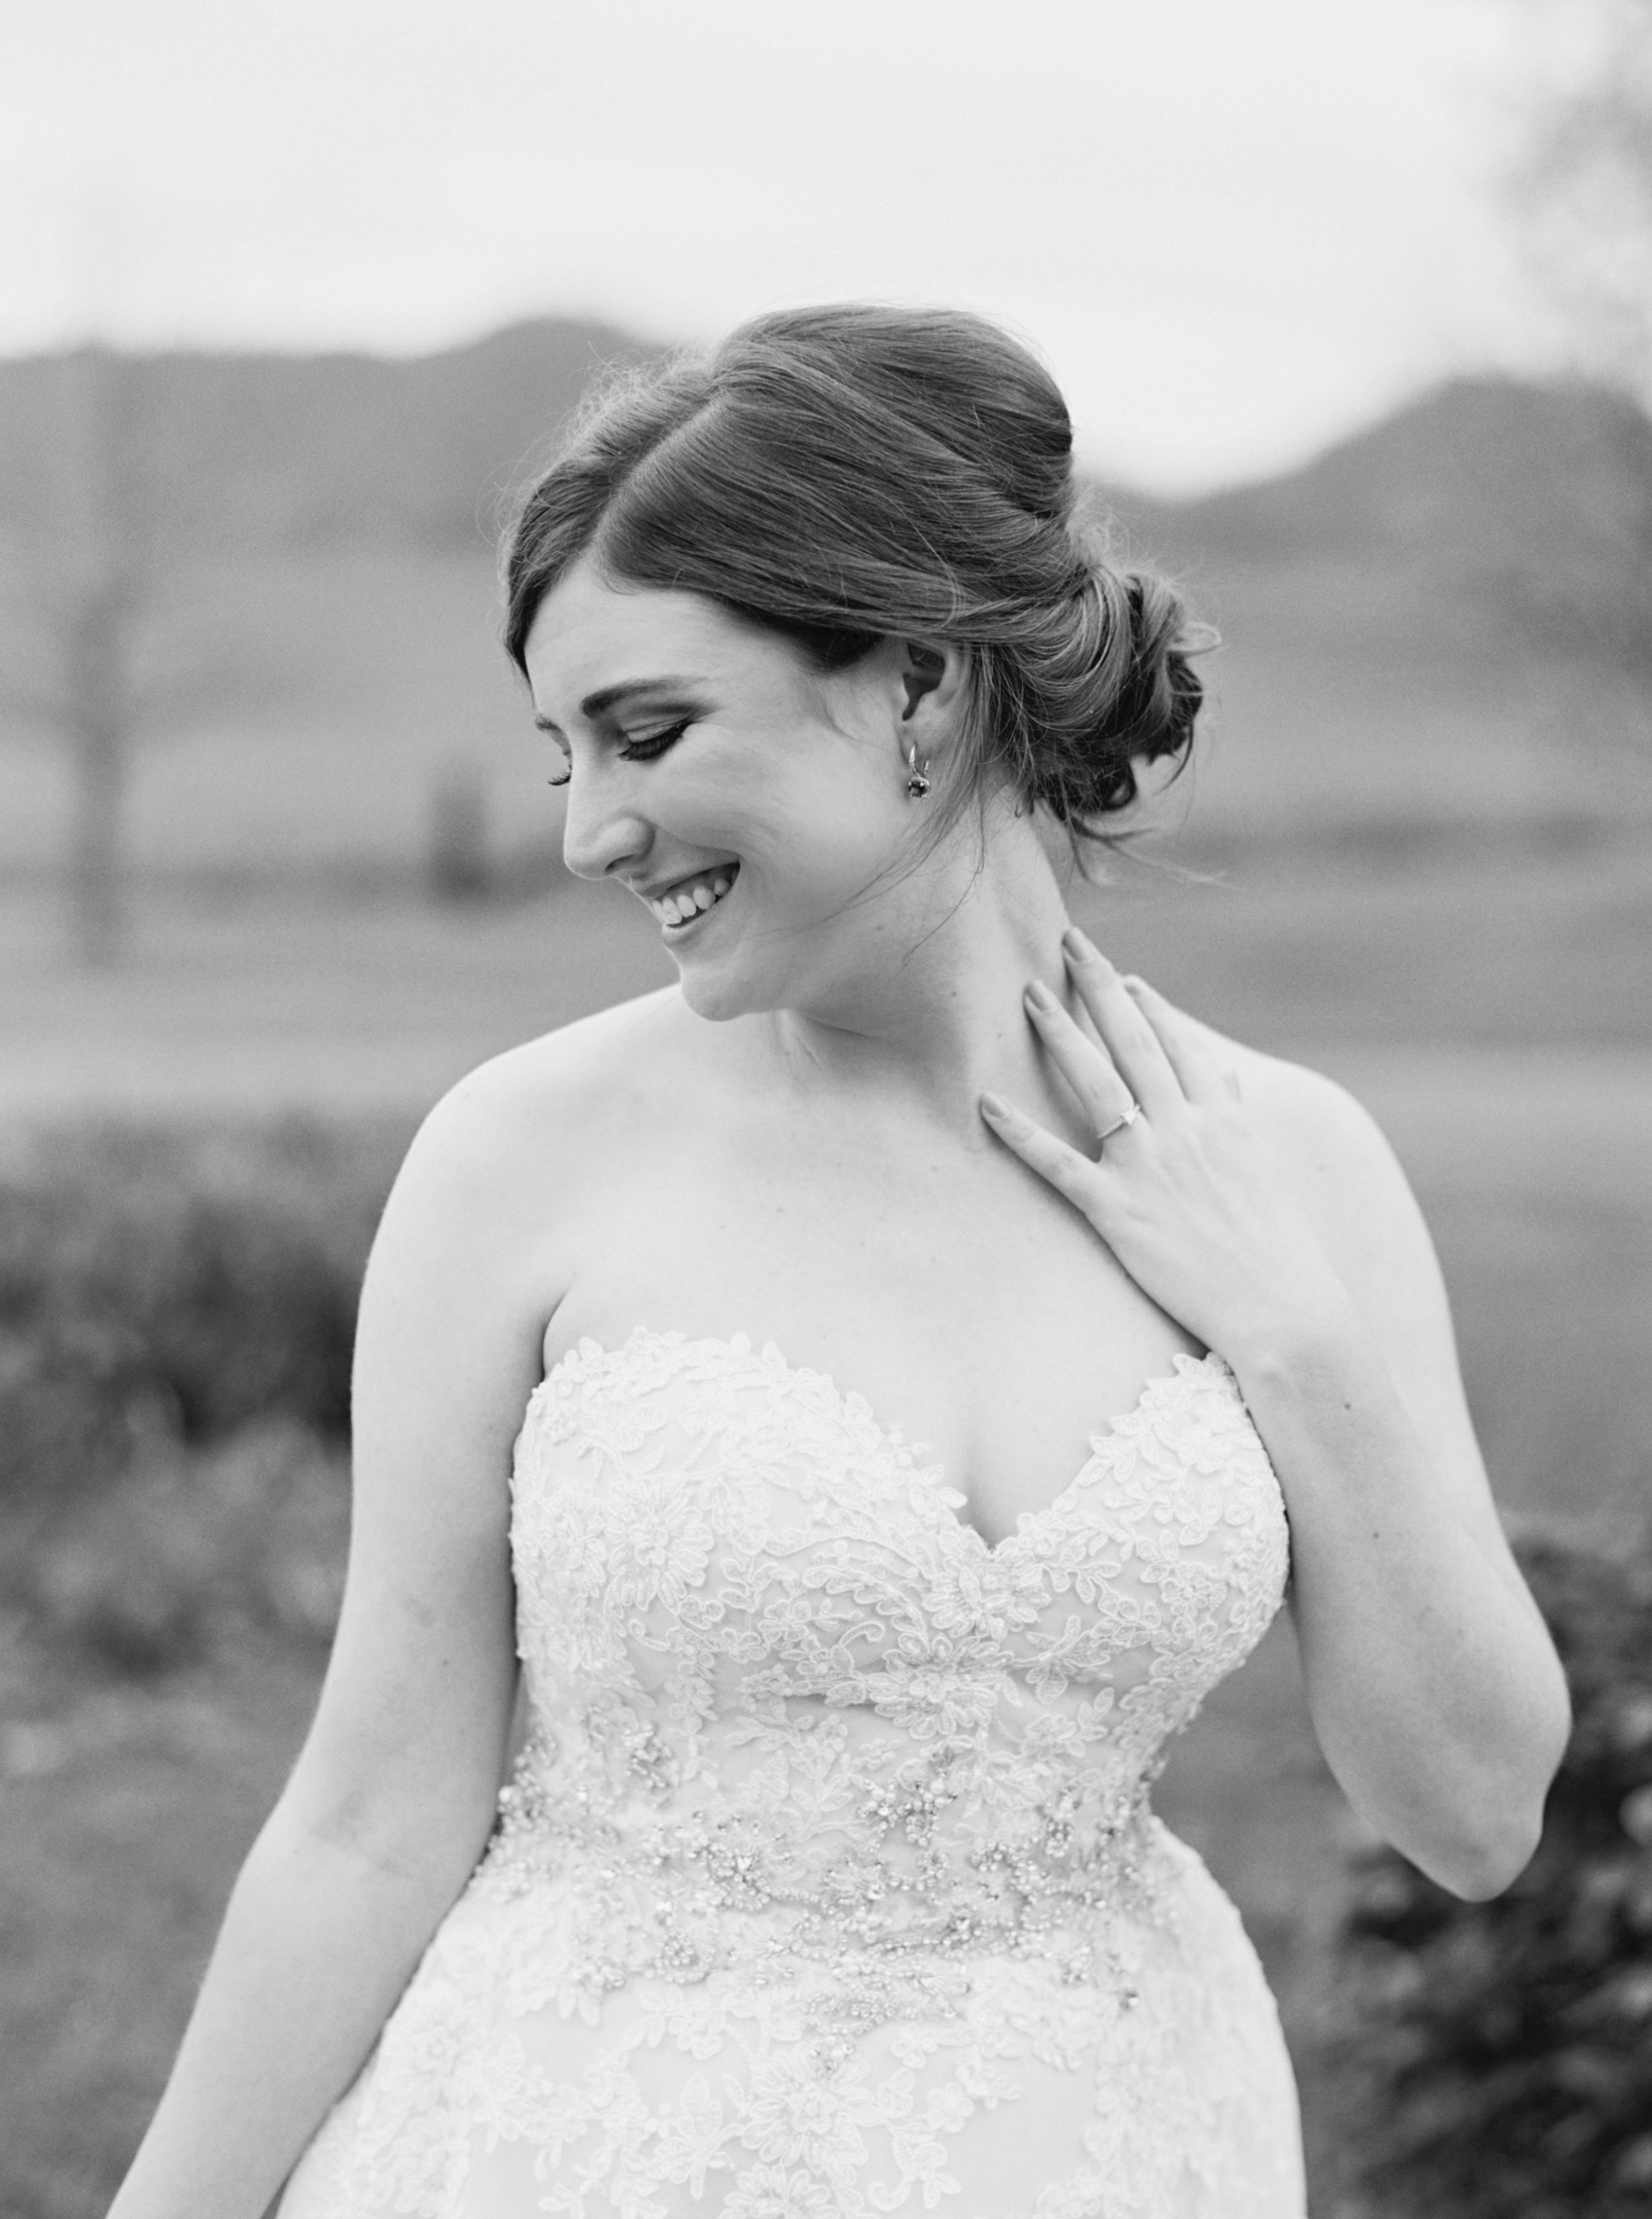 Lydia_johnathan_Wedding_Abigail_Malone_Photography-219.jpg